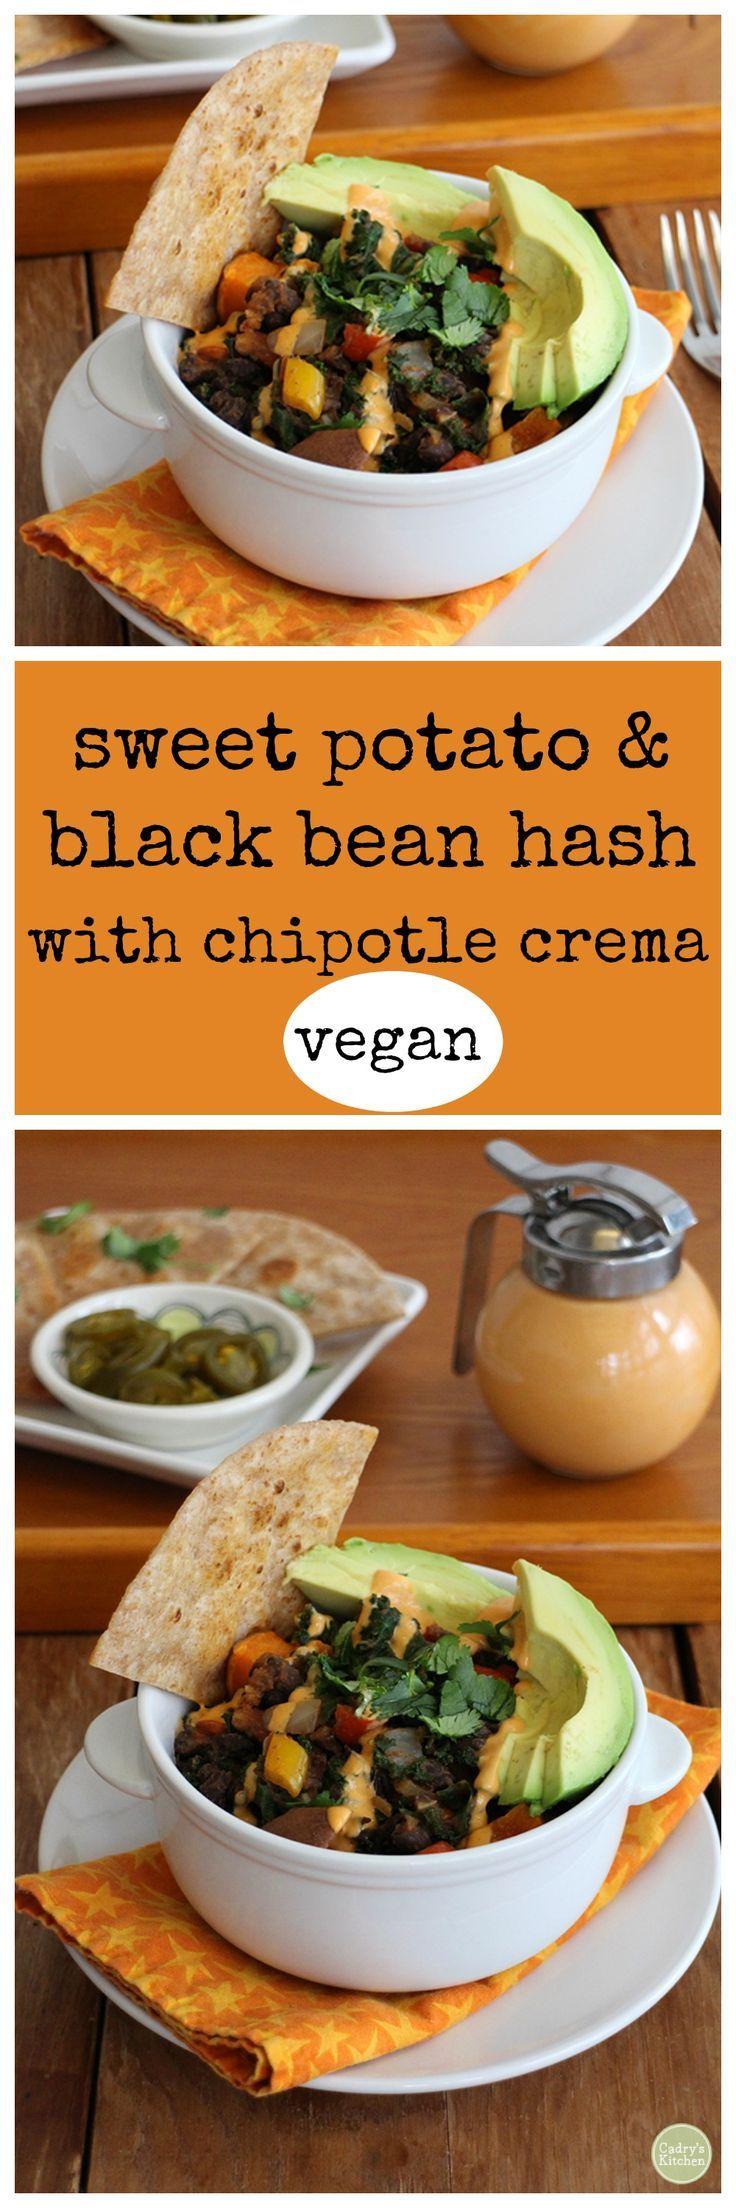 Sweet potato & black bean hash with chipotle crema - vegan   cadryskitchen.com